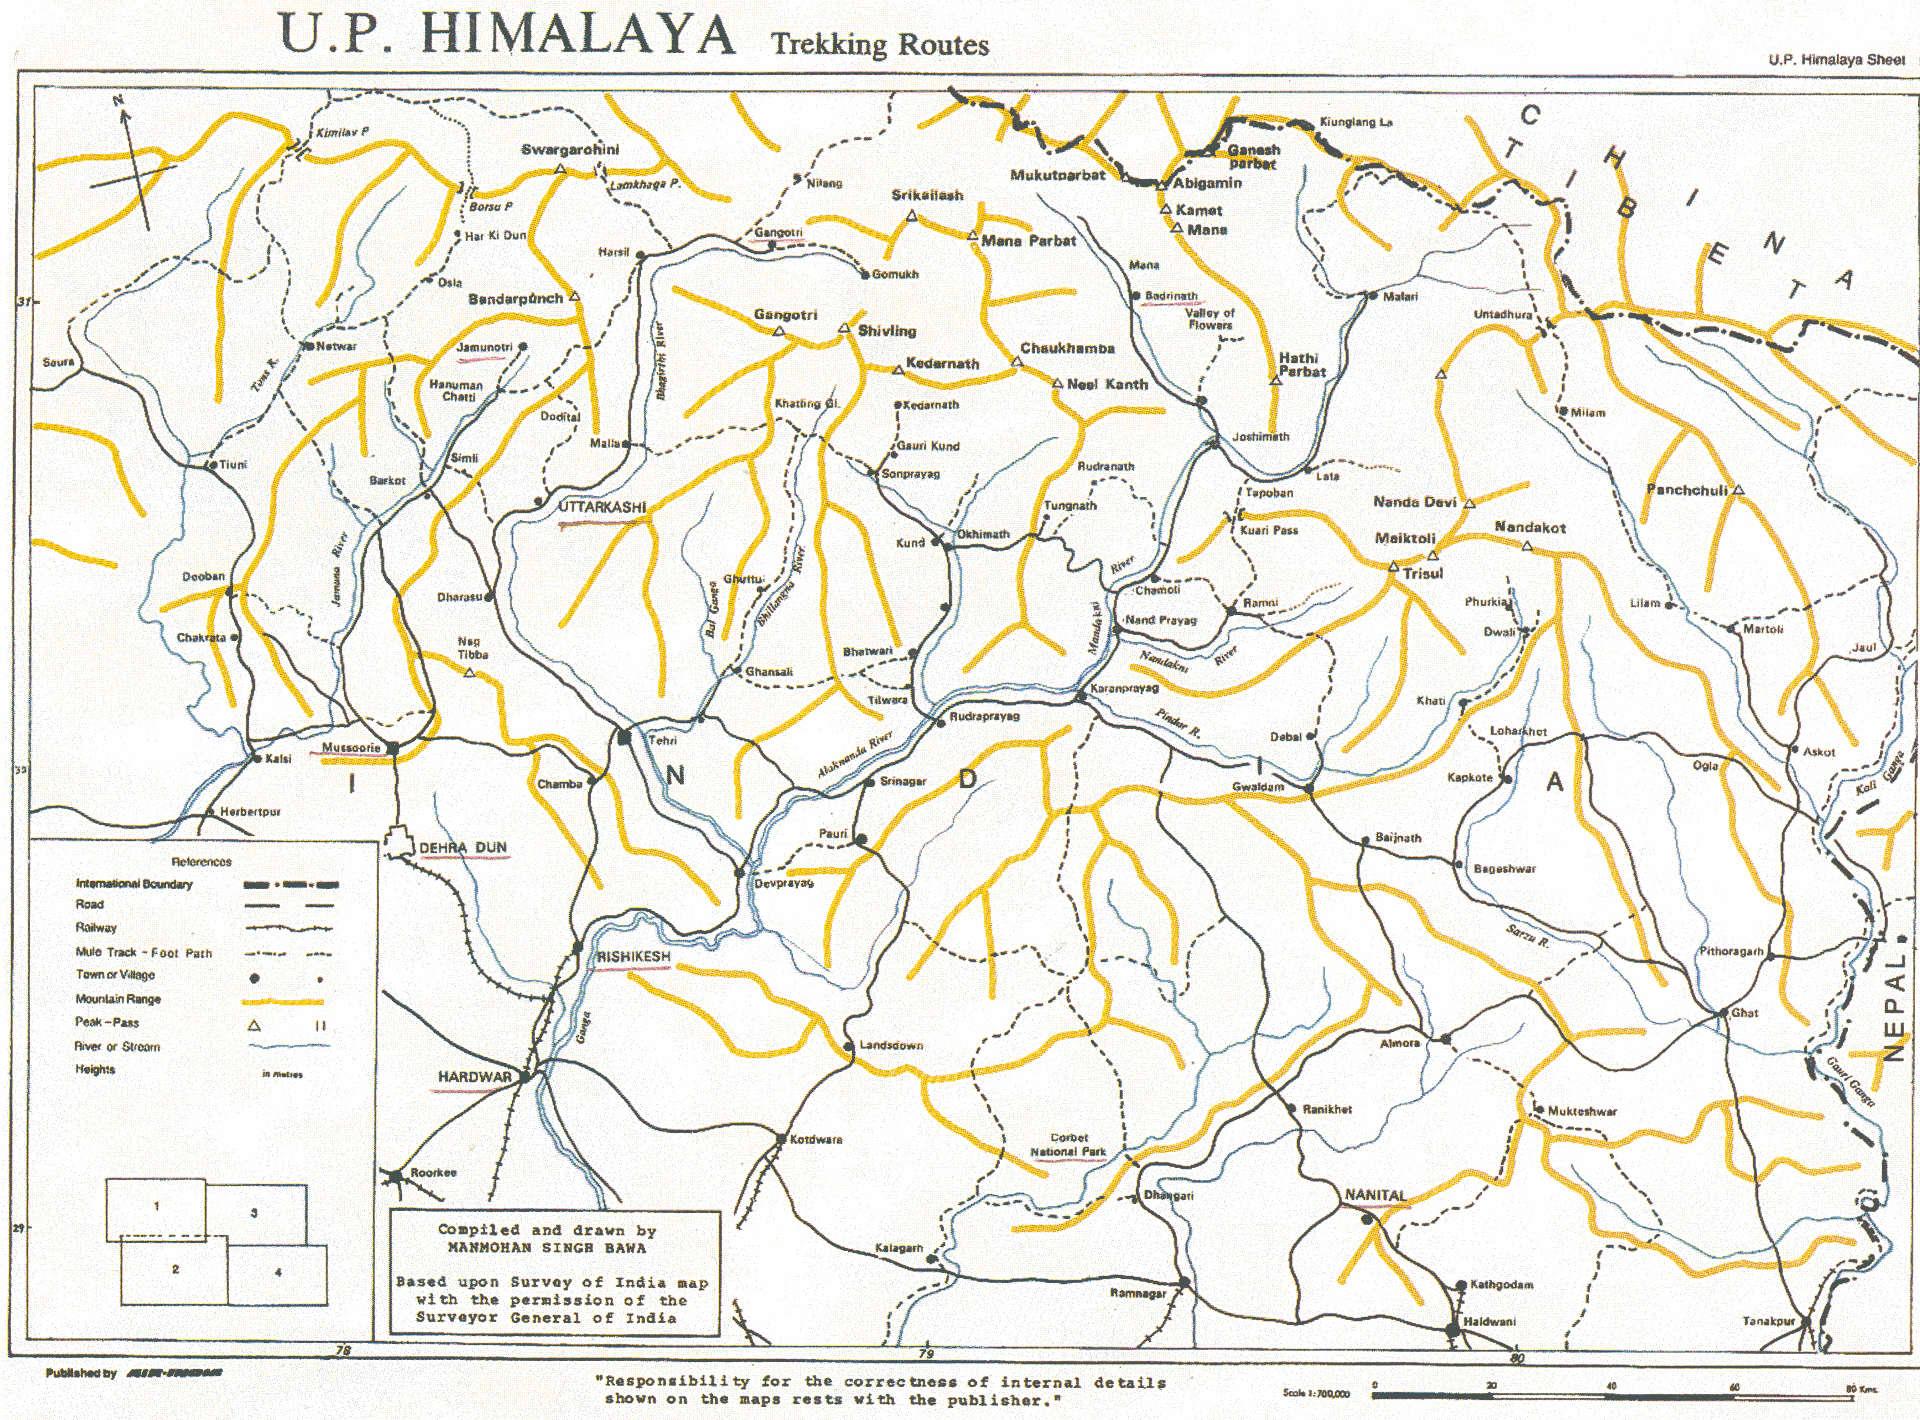 Карта туристических и трекинговых маршрутов штата Уттаранчал\ Харидвар, Ришикеш, Ганготри, Ямунотри, Уттаркаши, Муссури, Бадринатх, Нанитал, Алмора